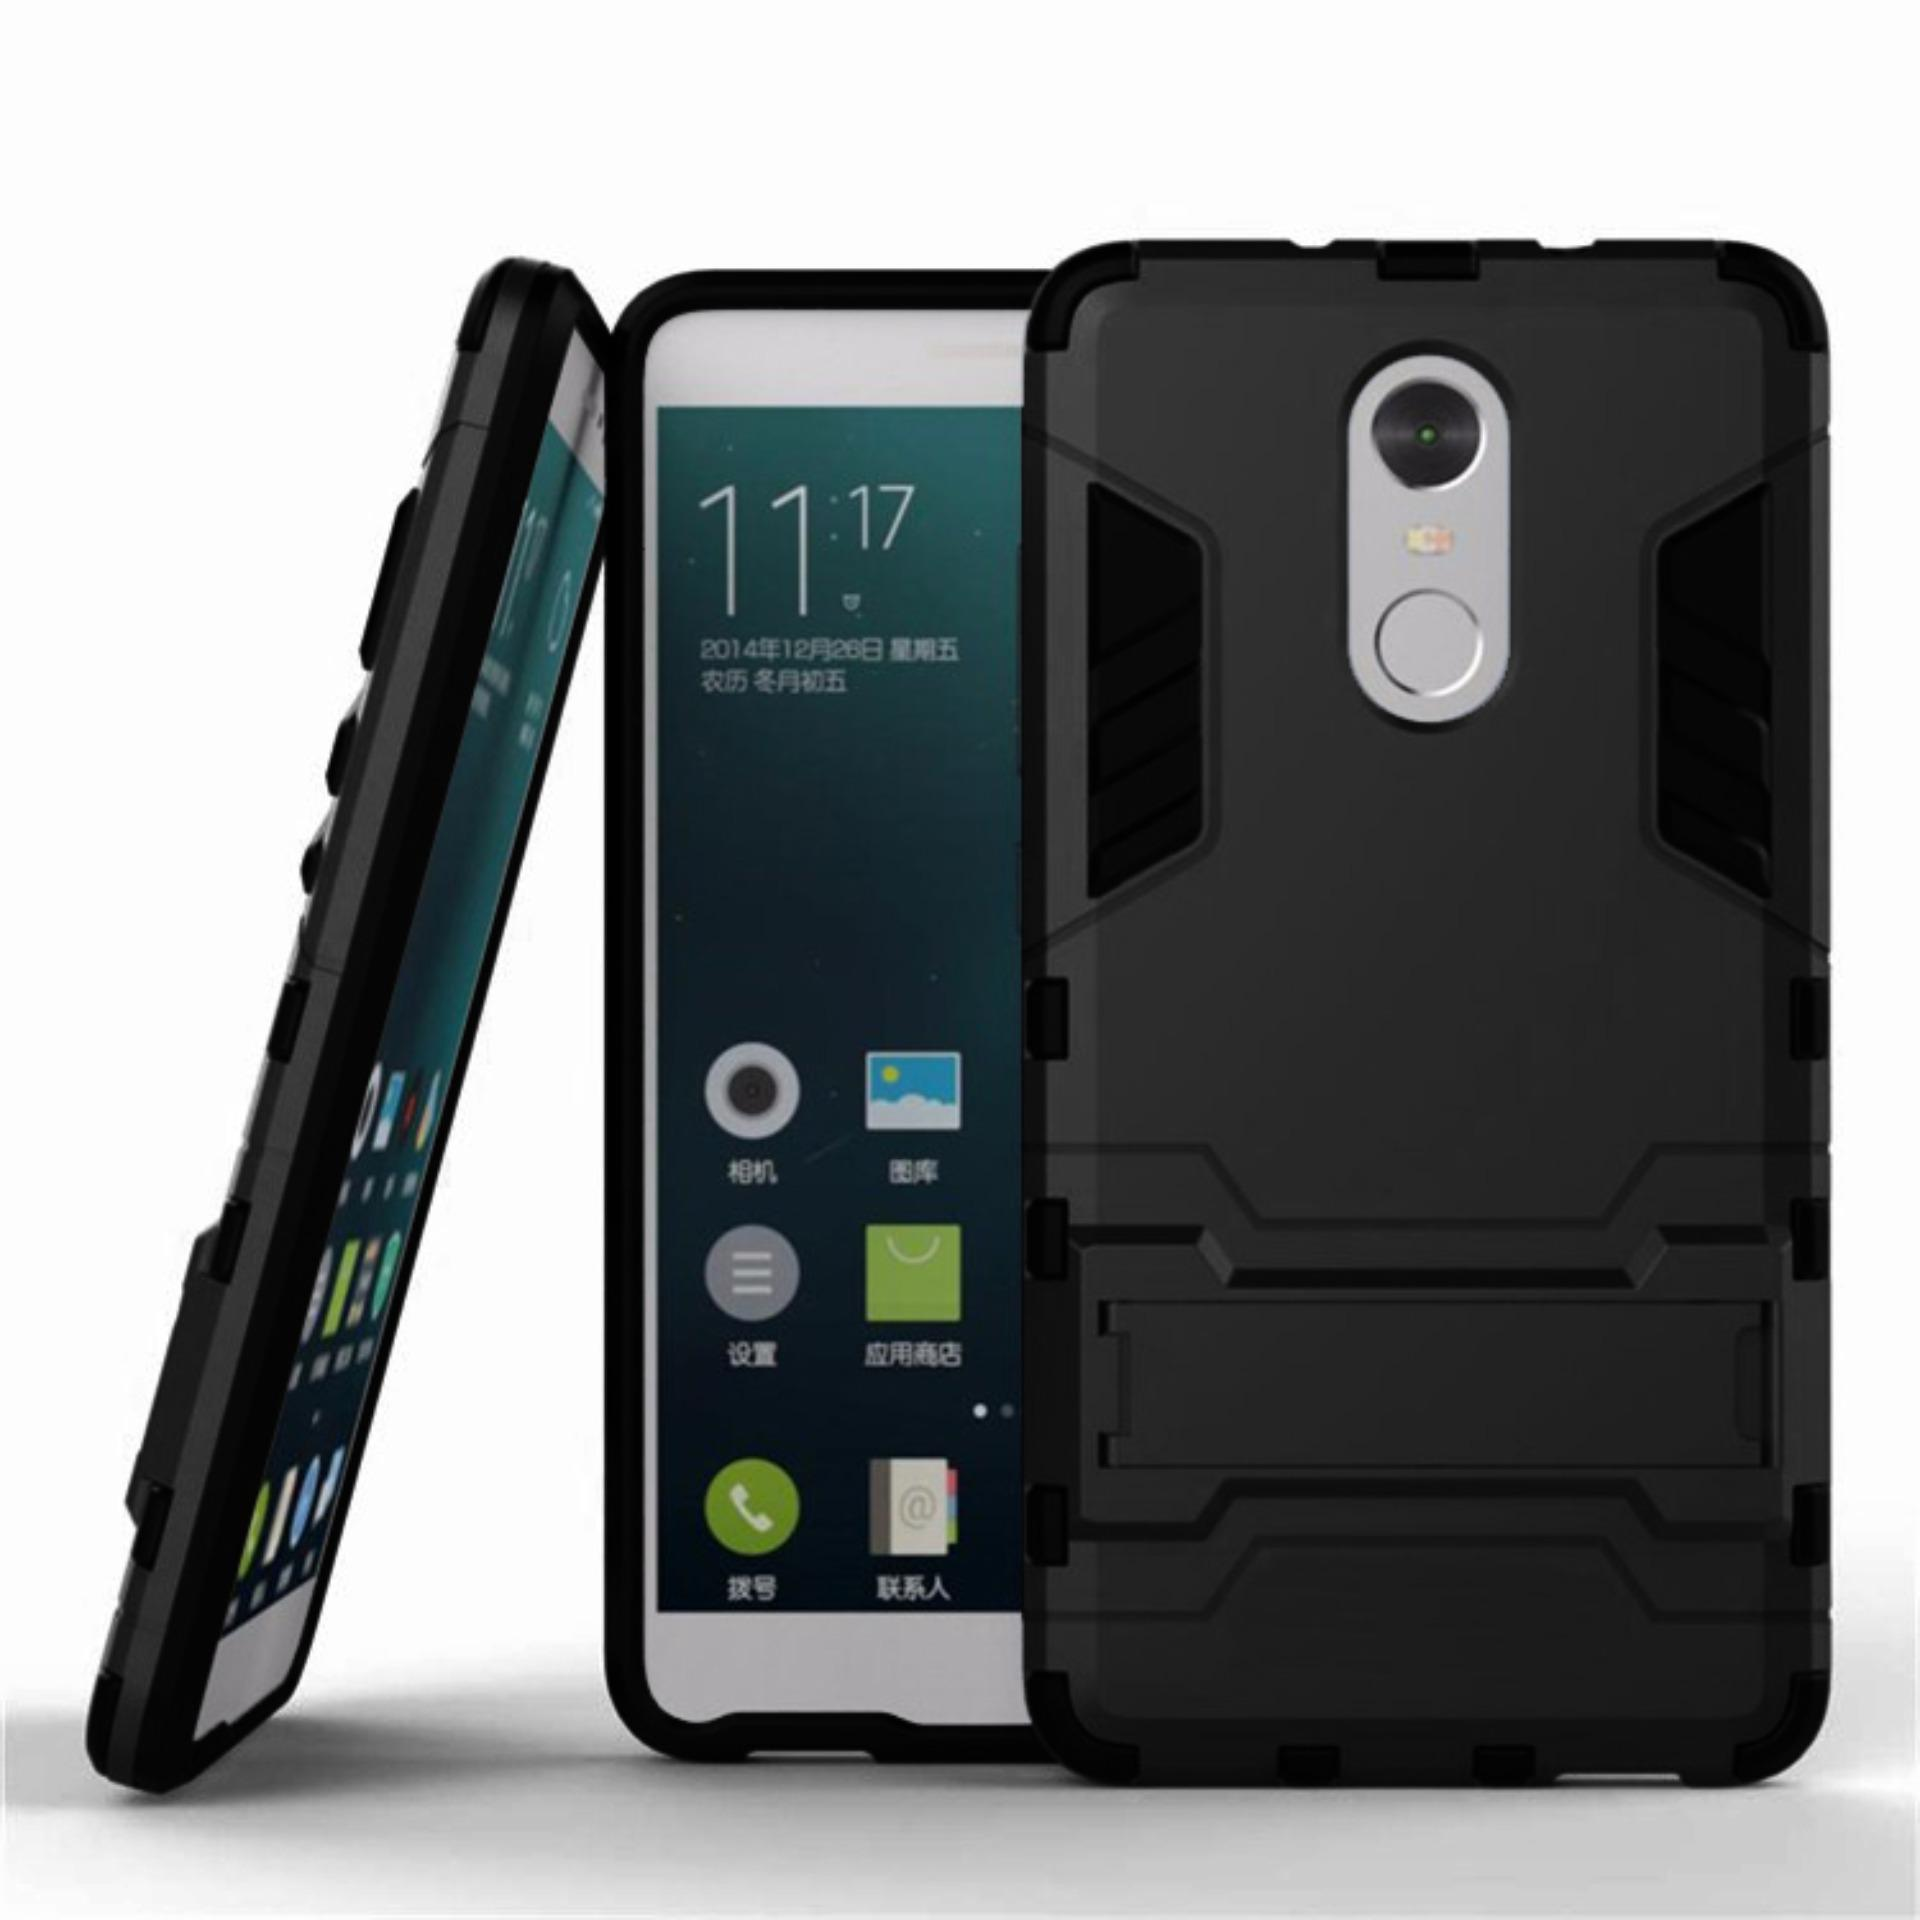 Cek Harga Baru Procase Shield Rugged Kickstand Armor Iron Man Pc Tpu Back Covers For Xiaomi Redmi Note 4x Mediatek Full Black Terkini Januari 2019